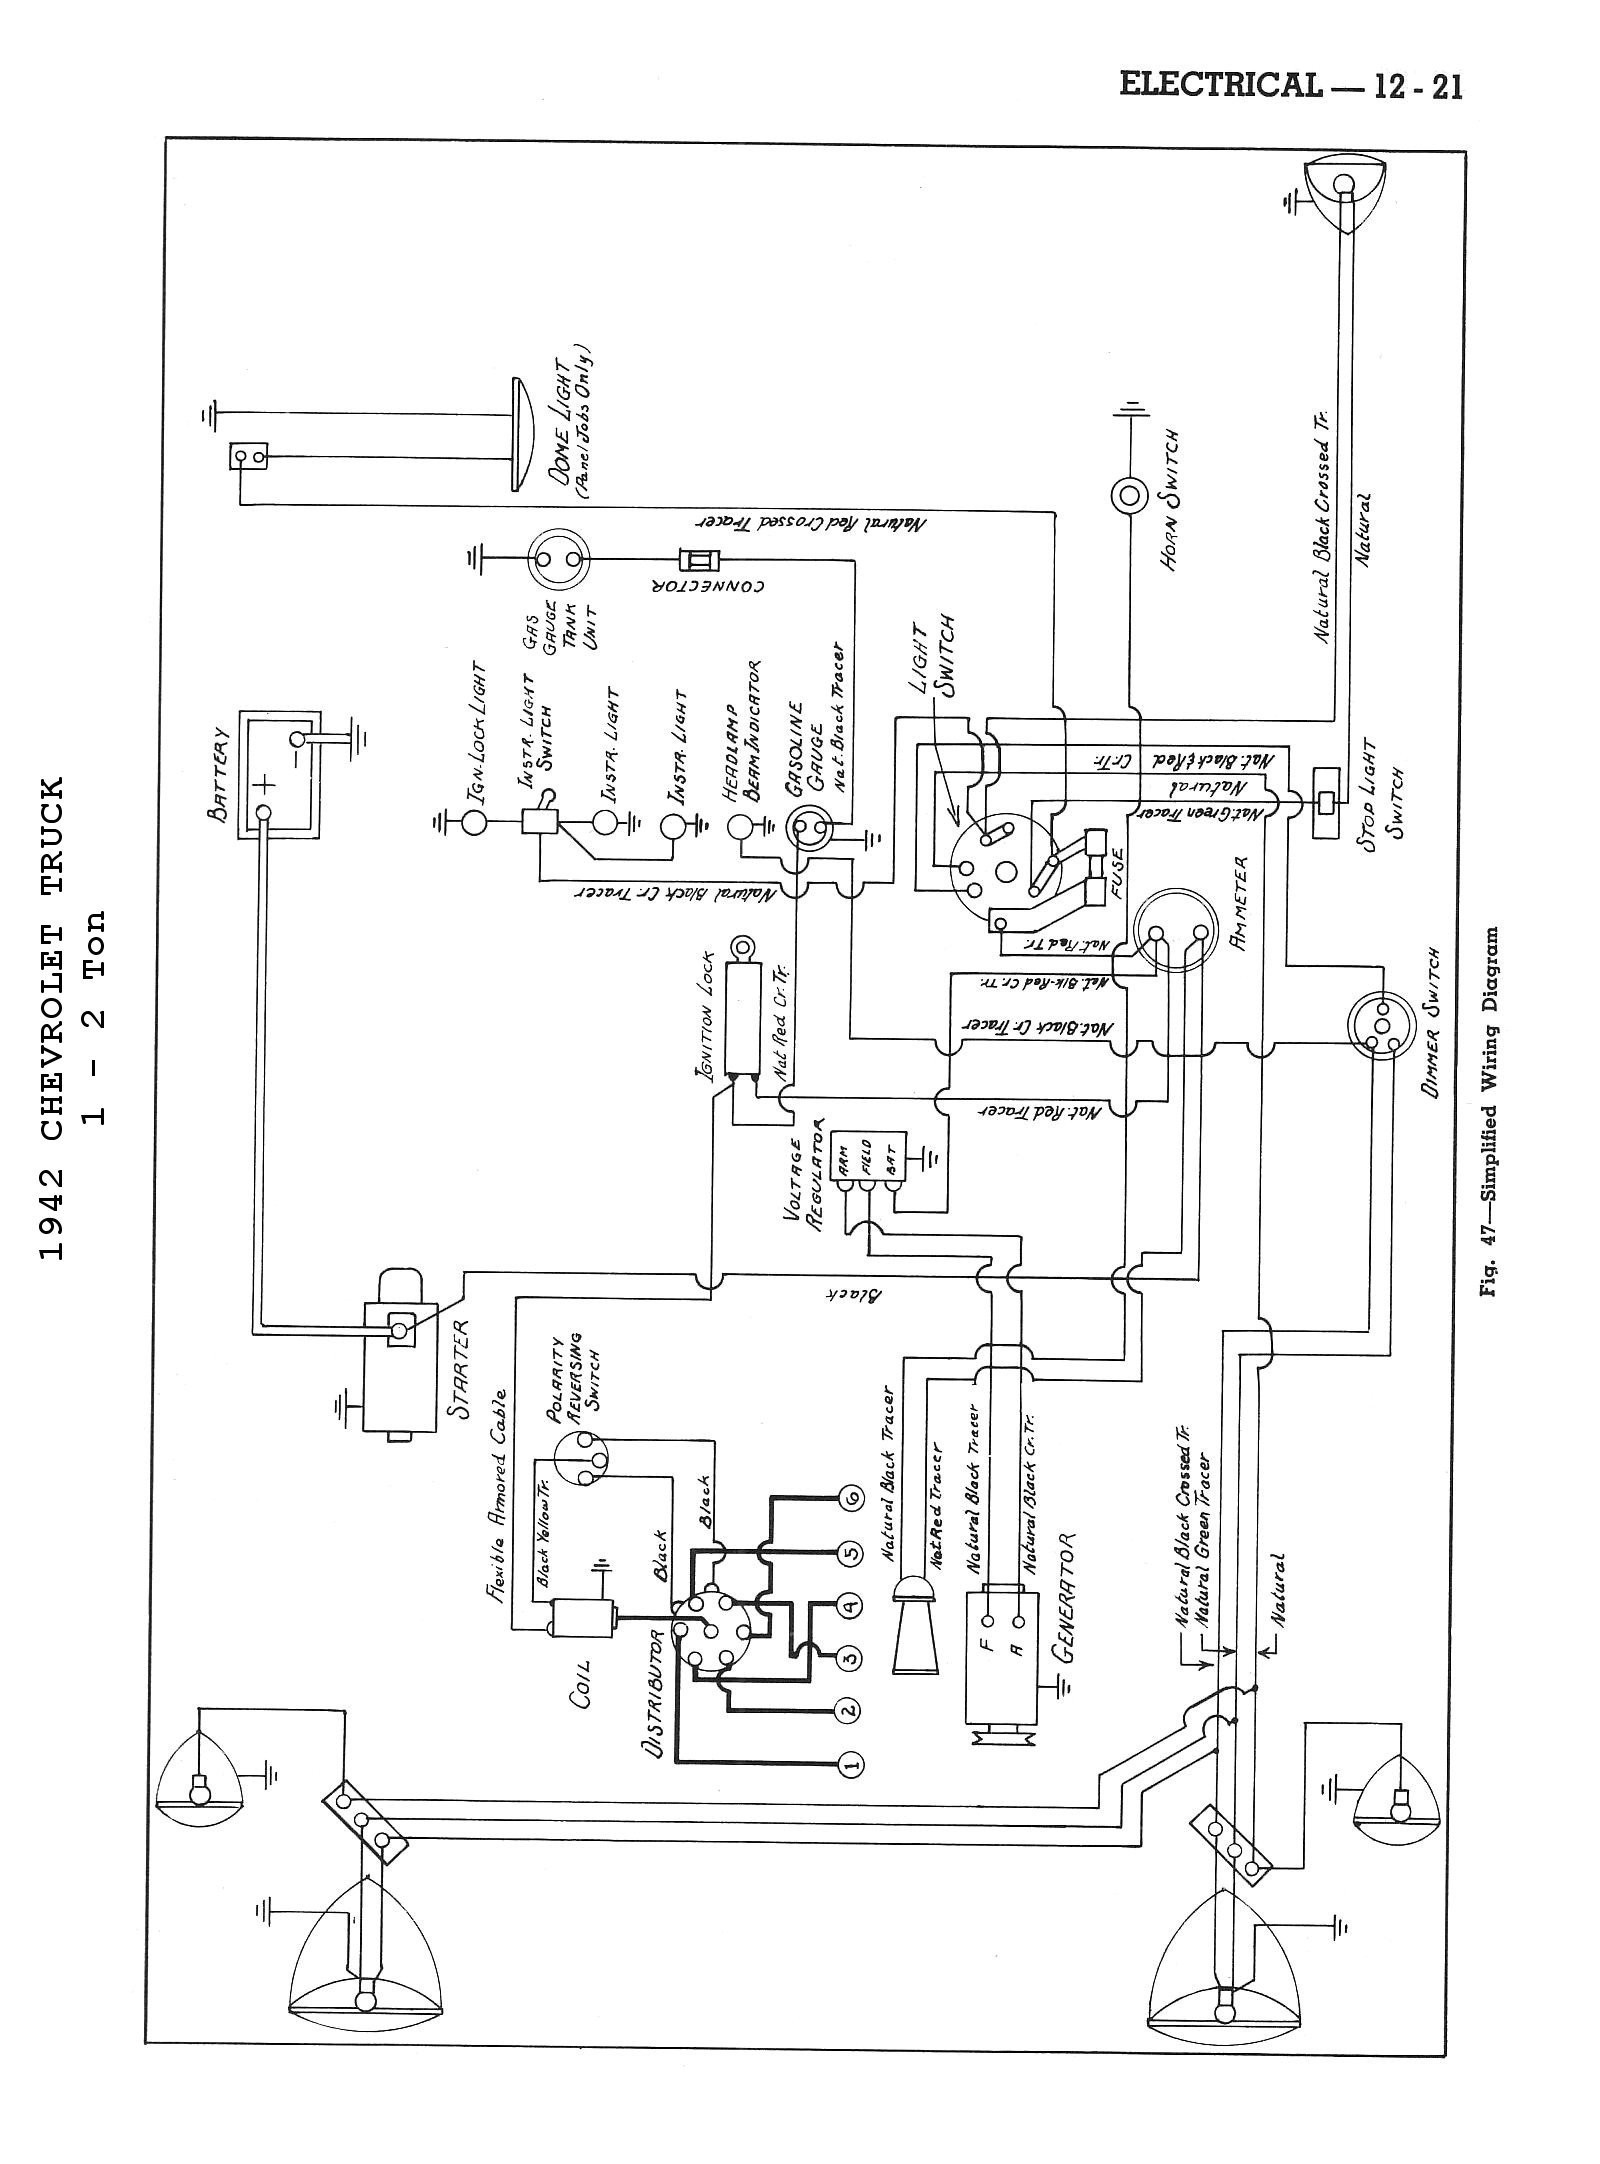 Alternator Wiring Diagram Inspirational